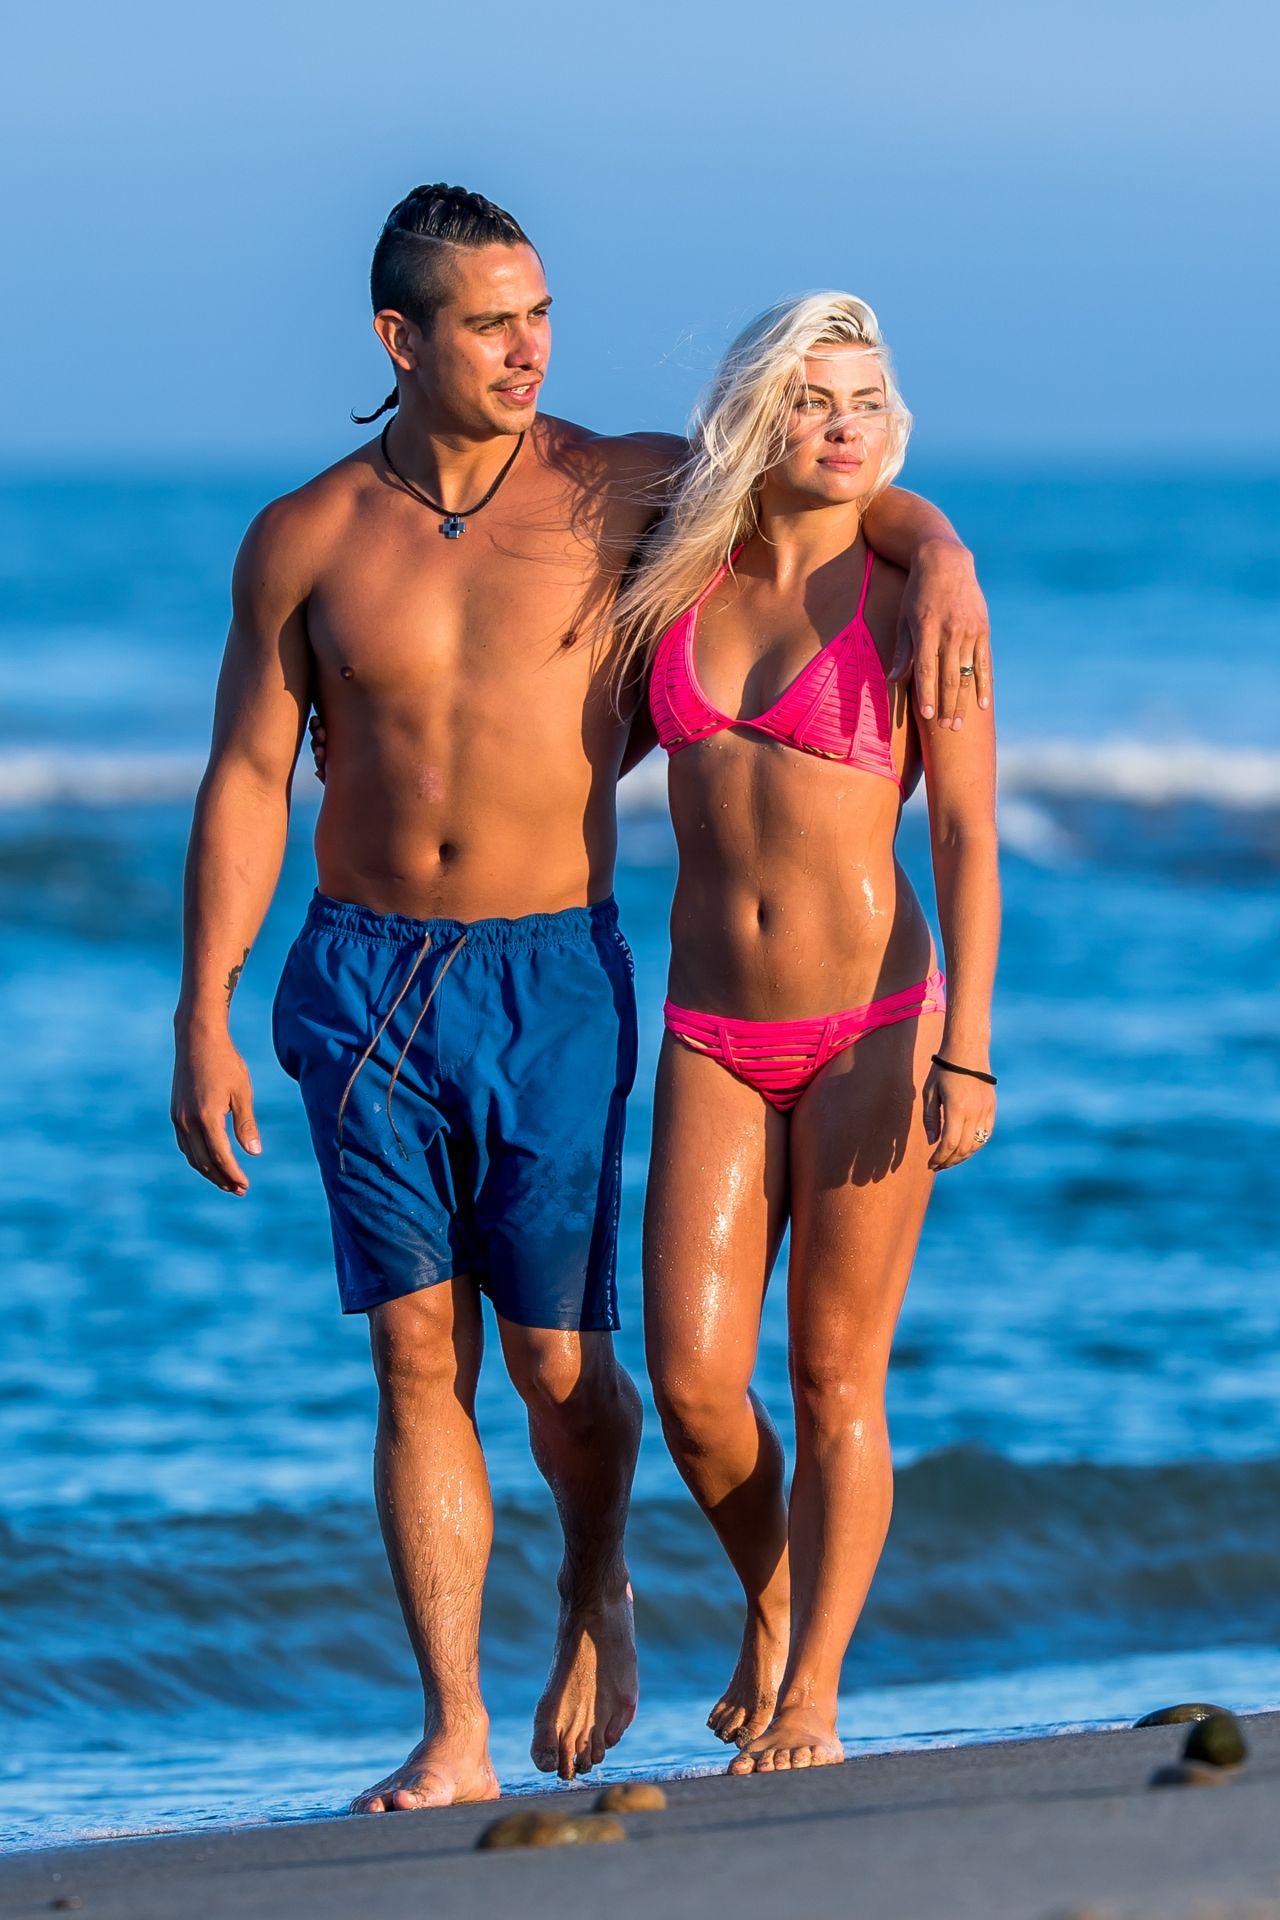 Oksana Platero In A Bikini Beach In Malibu 07 13 2017